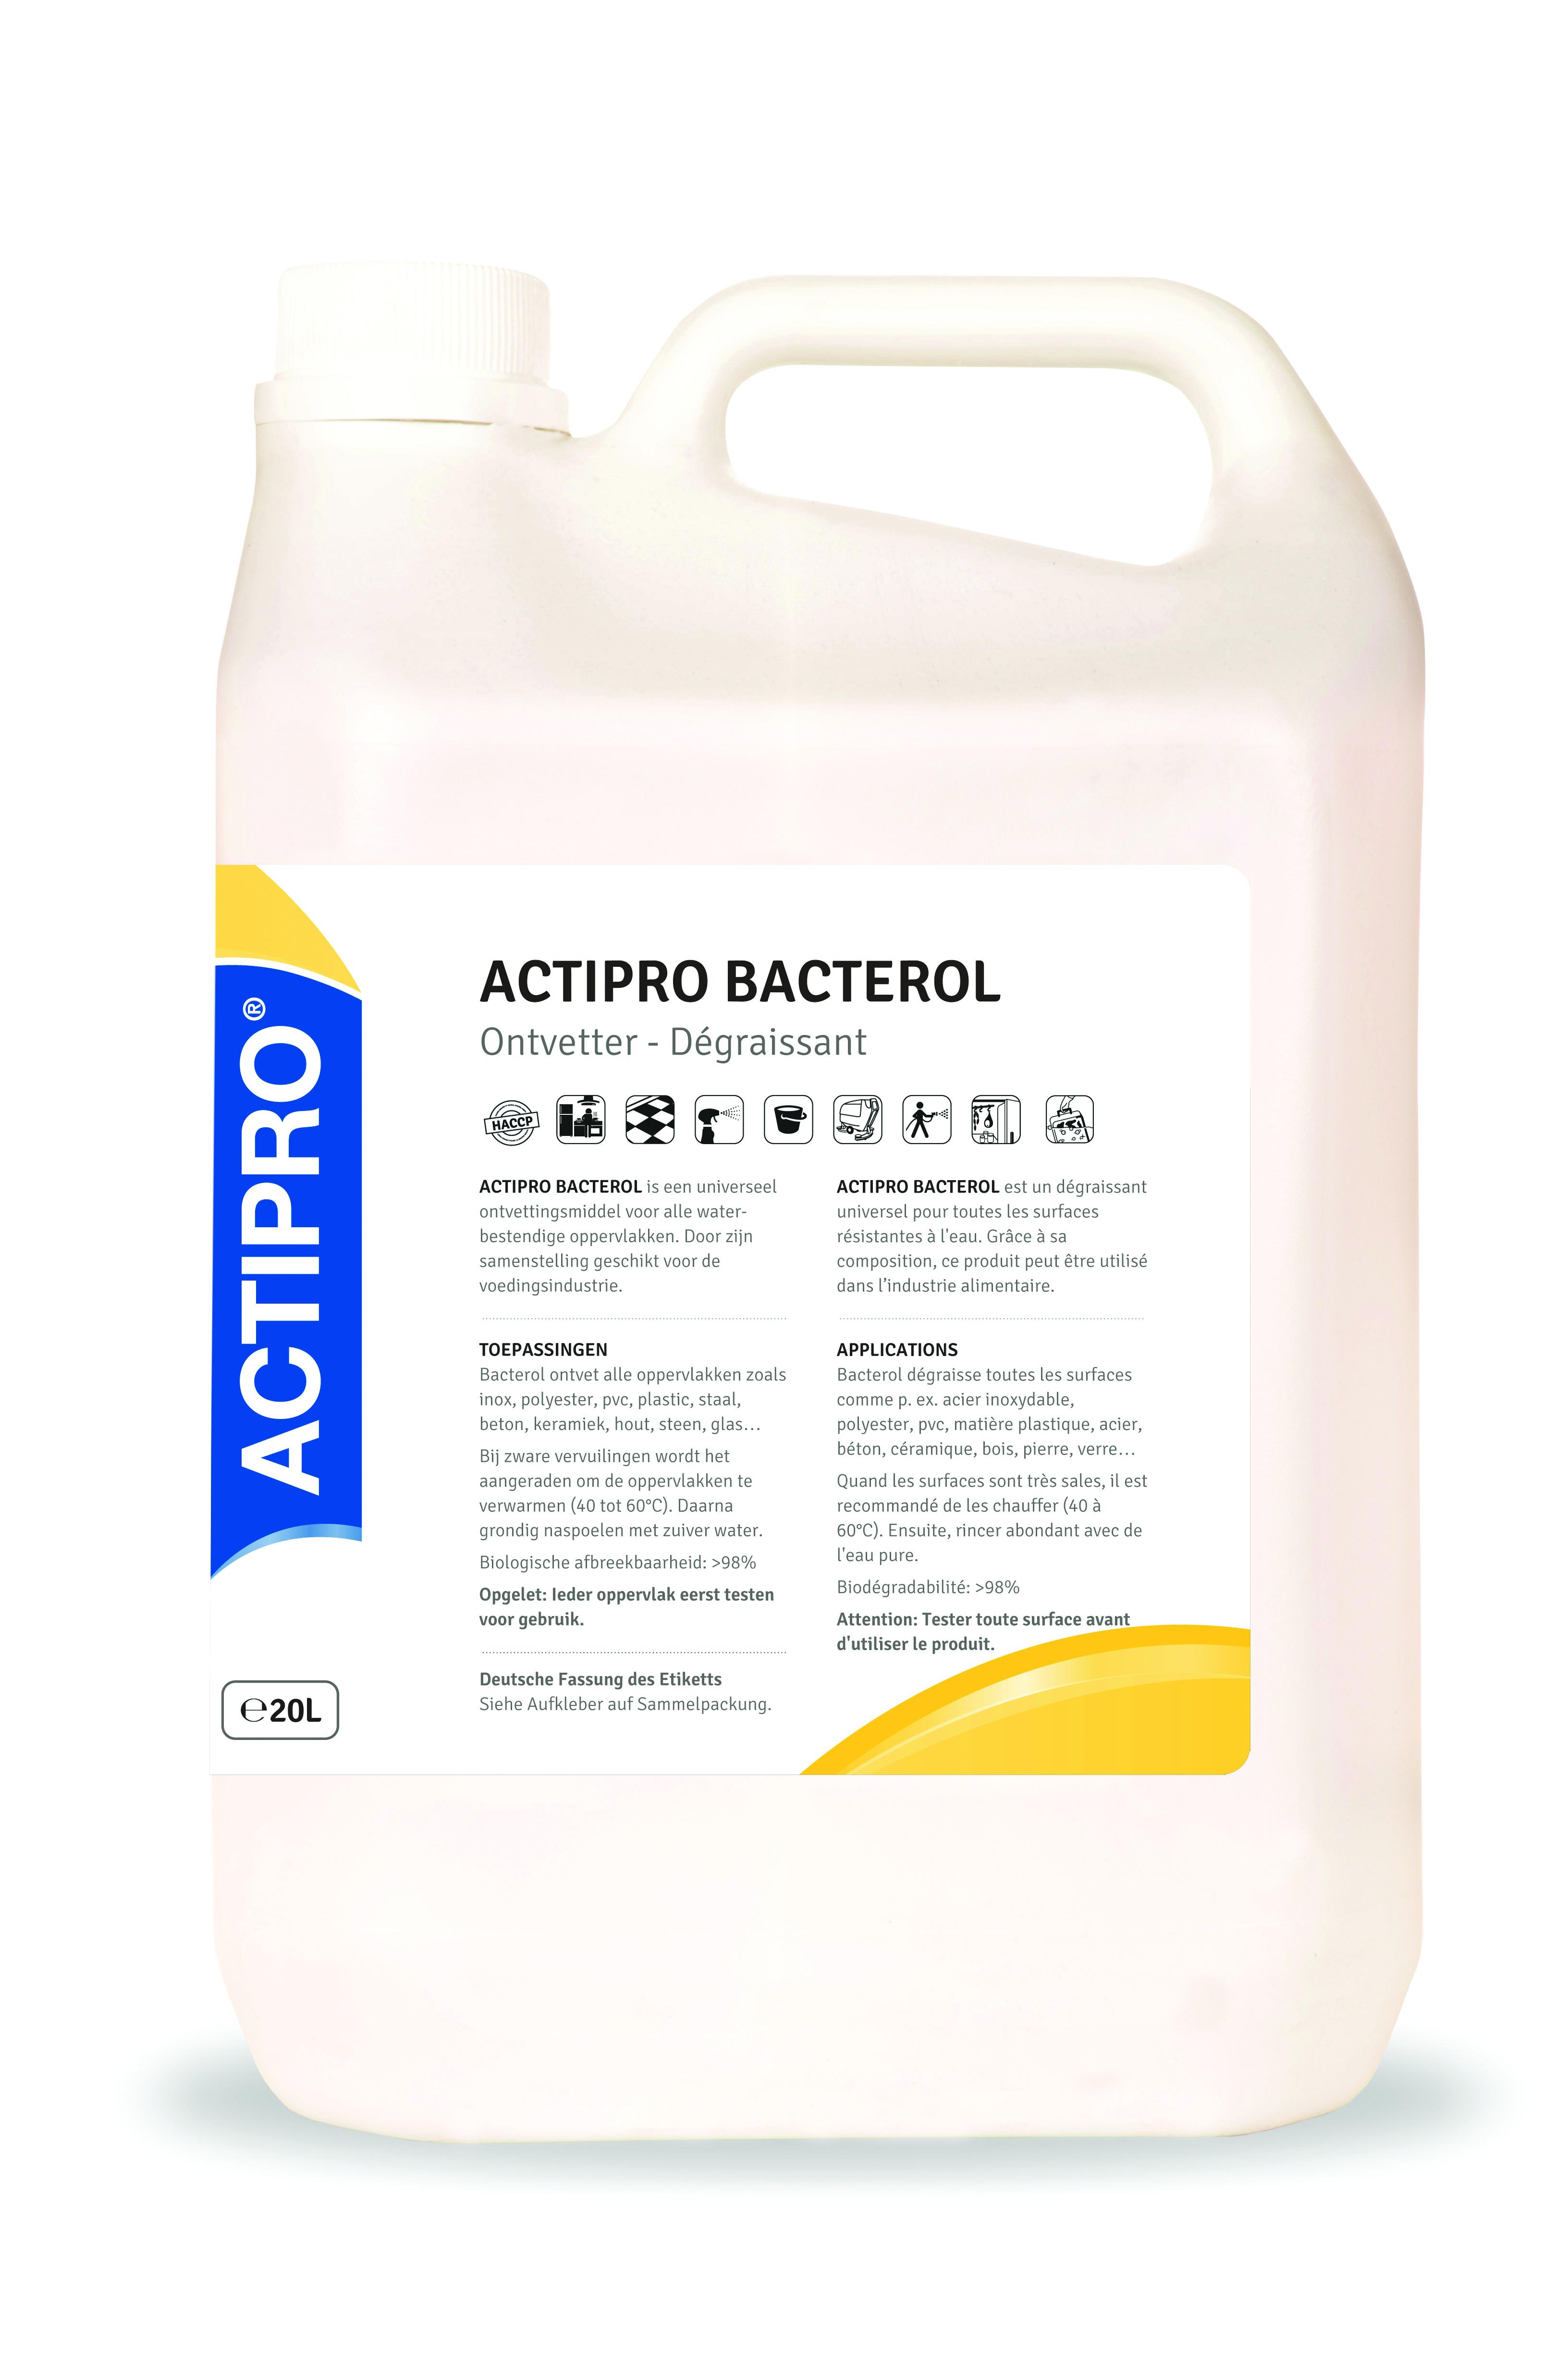 ACTIPRO Bacterol ontvetter